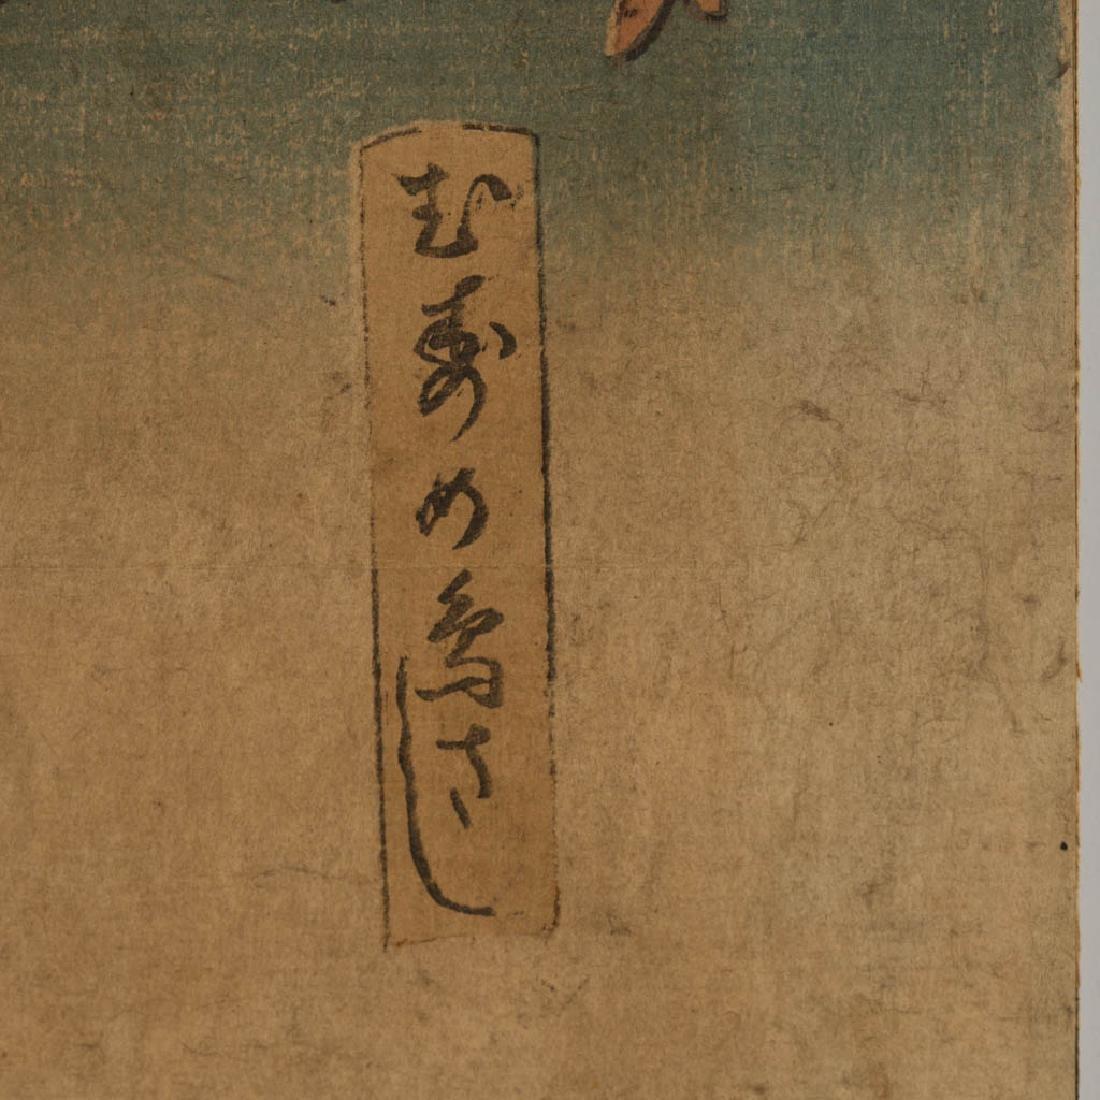 KUNISADA UTAGAWA / TOYOKUNI III (JAPANESE, 1786-1844) - 10